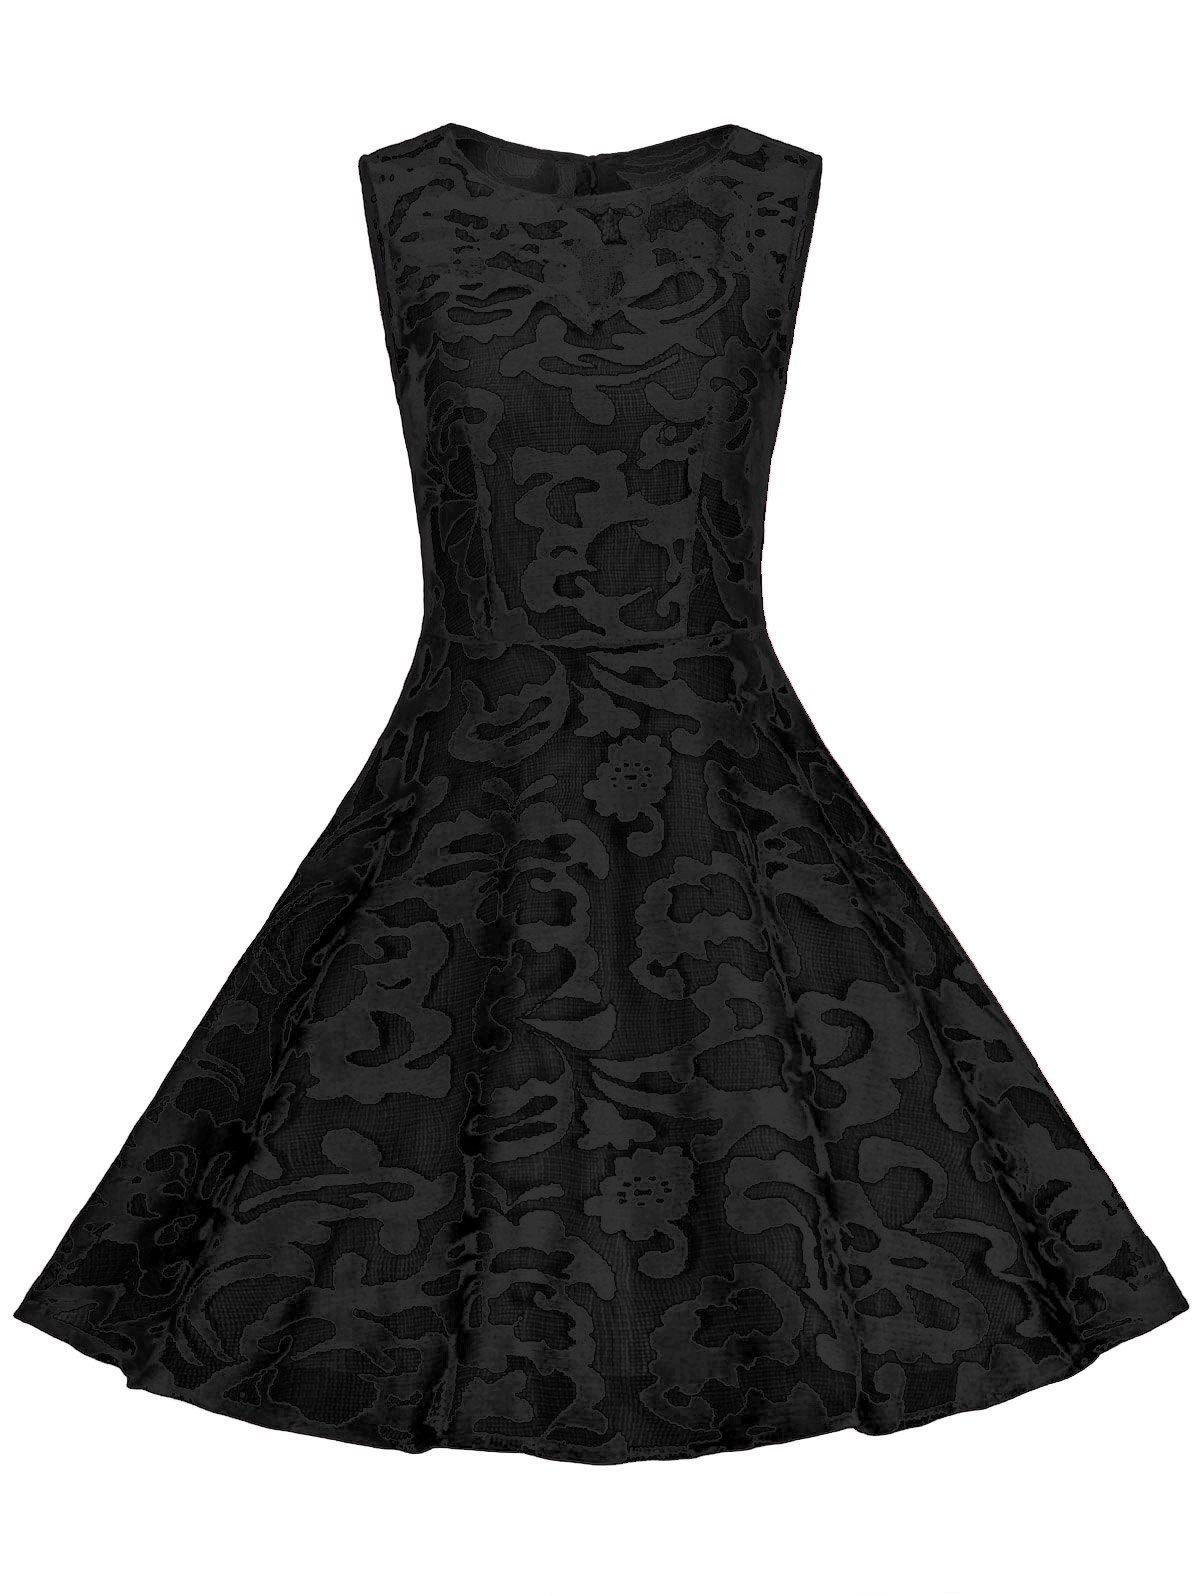 Sheer vintage lace plus size a line dress in full black sammydress